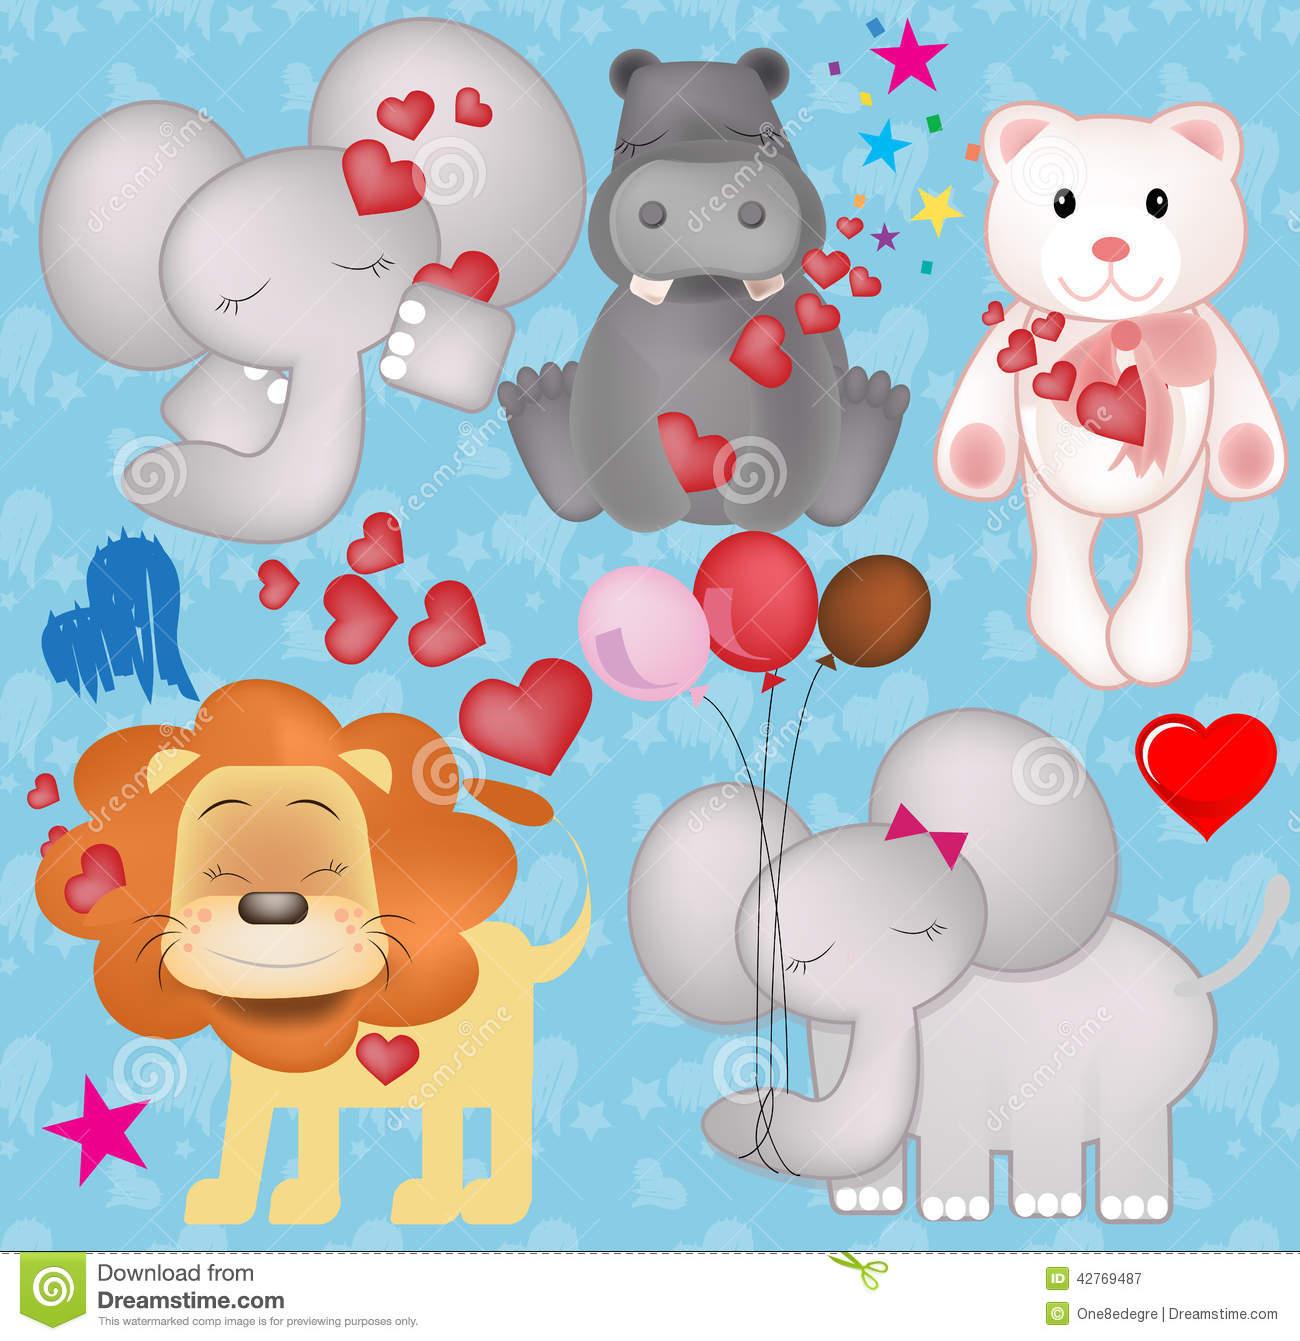 Valentine animal gram clipart jpg transparent stock Cute Valentine Animals Photo Album - Best easter gift ever jpg transparent stock